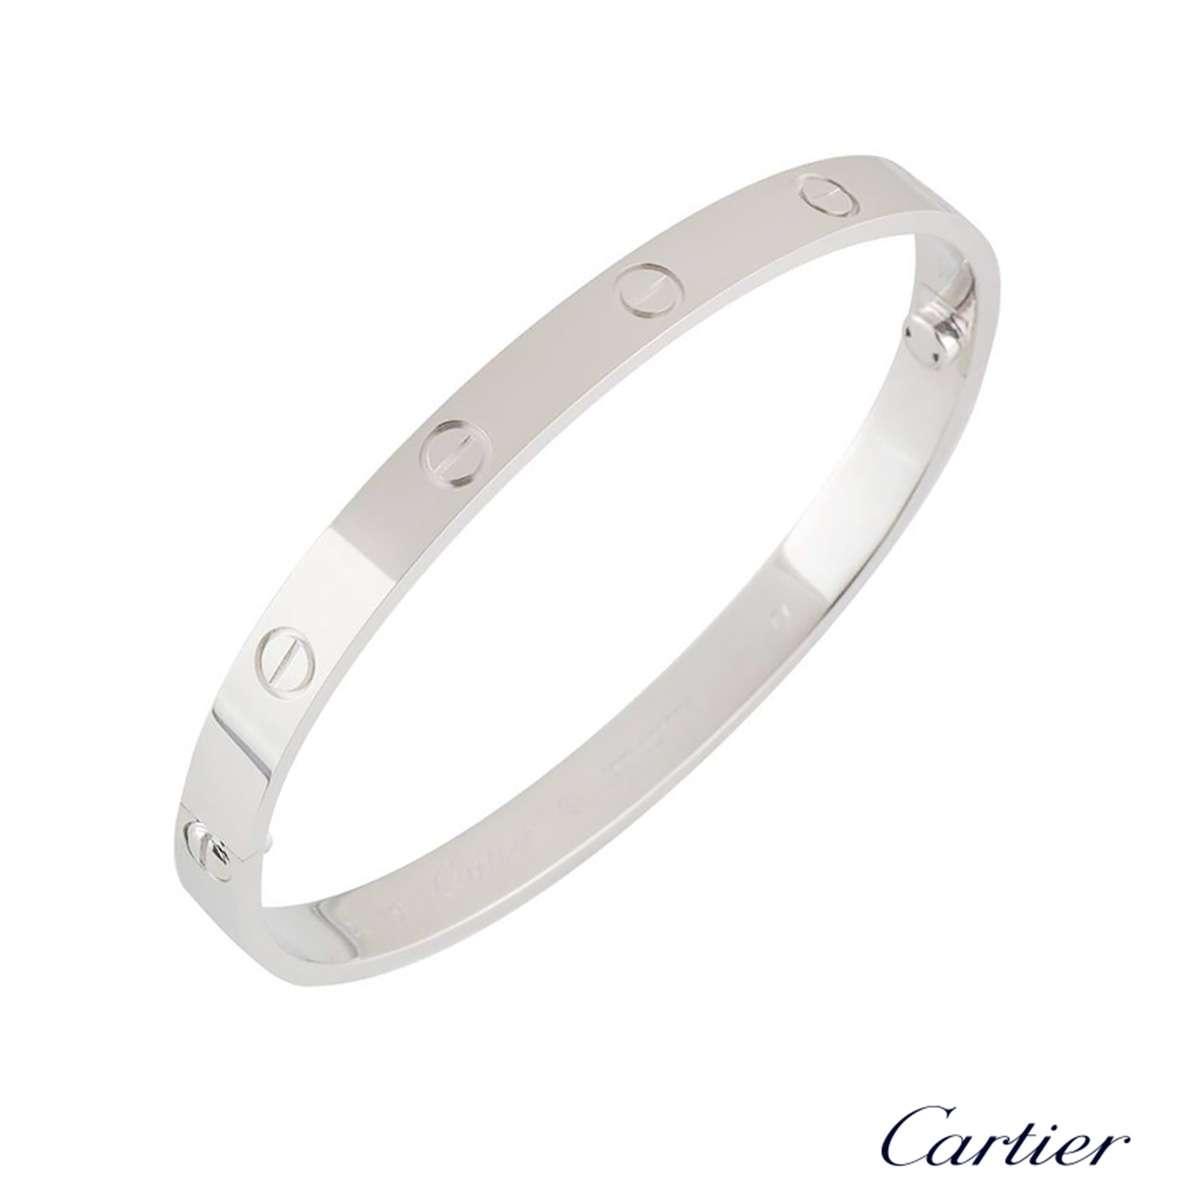 Cartier White Gold Plain Love Bracelet Size 19 B6035419